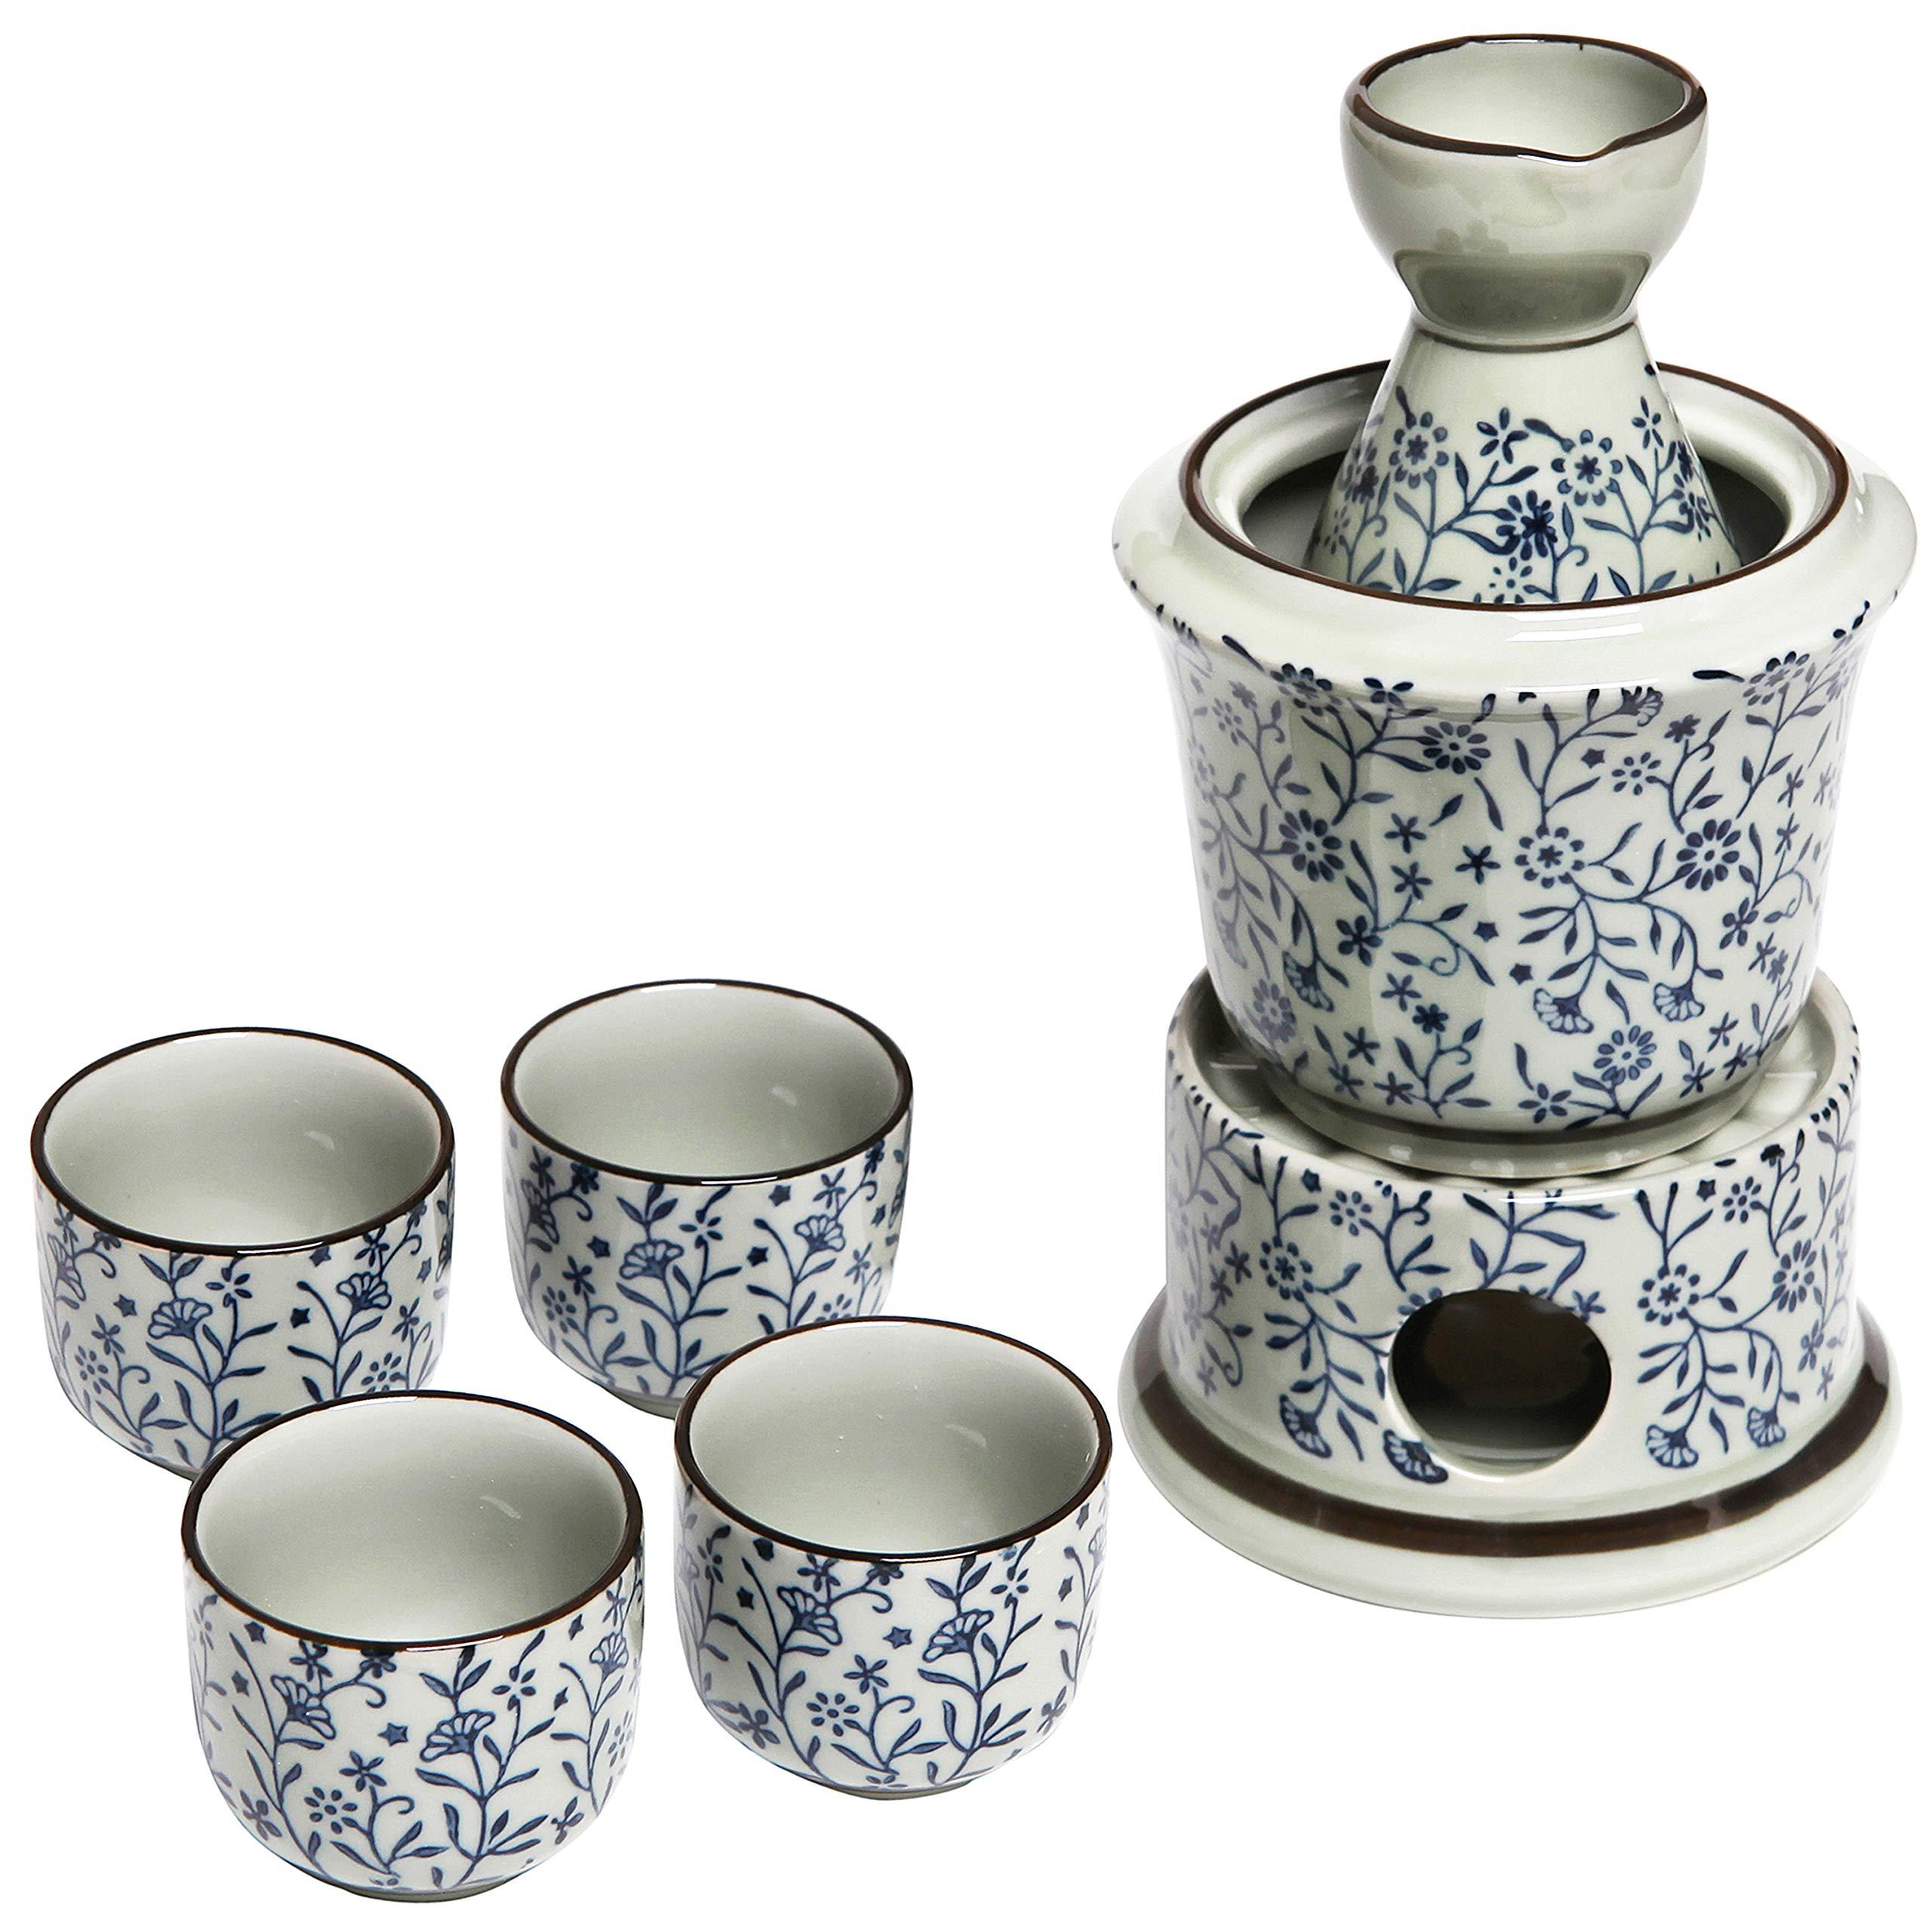 Exquisite Ceramic Blue Flowers Japanese Sake Set w/ 4 Shot Glass/Cups, Serving Carafe & Warmer Bowl by MyGift